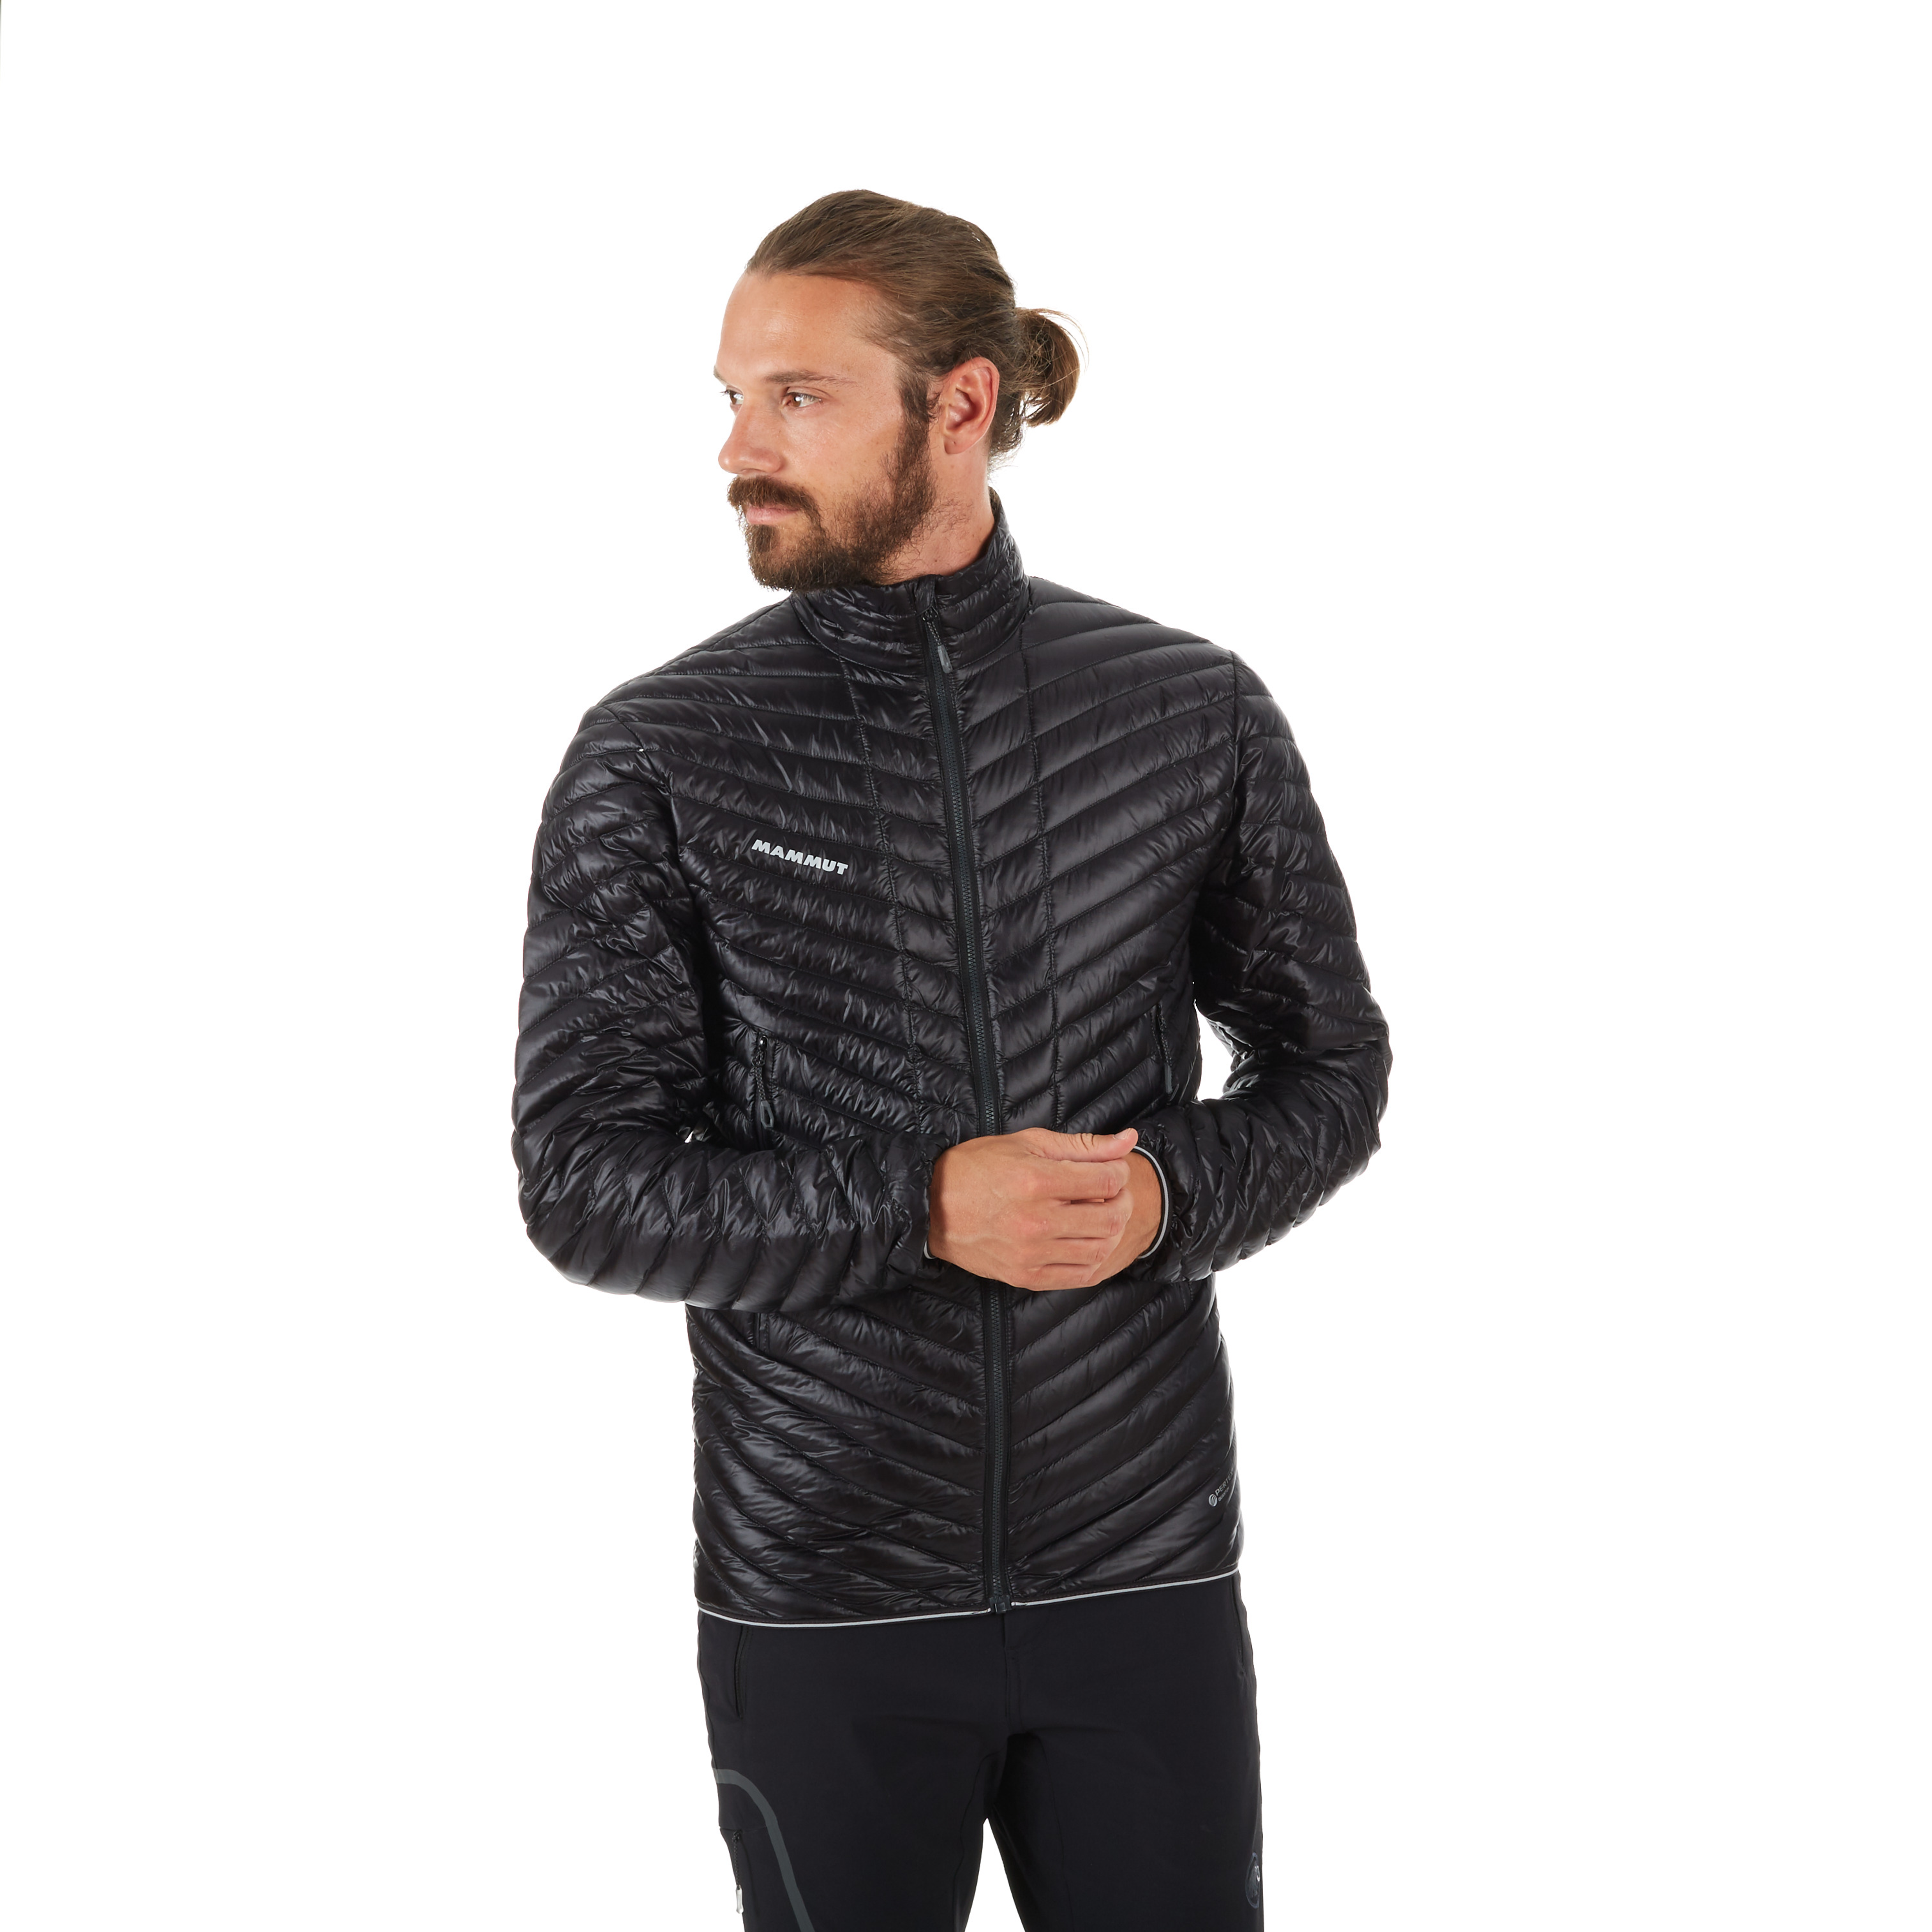 Broad Peak Light IN Jacket Men product image